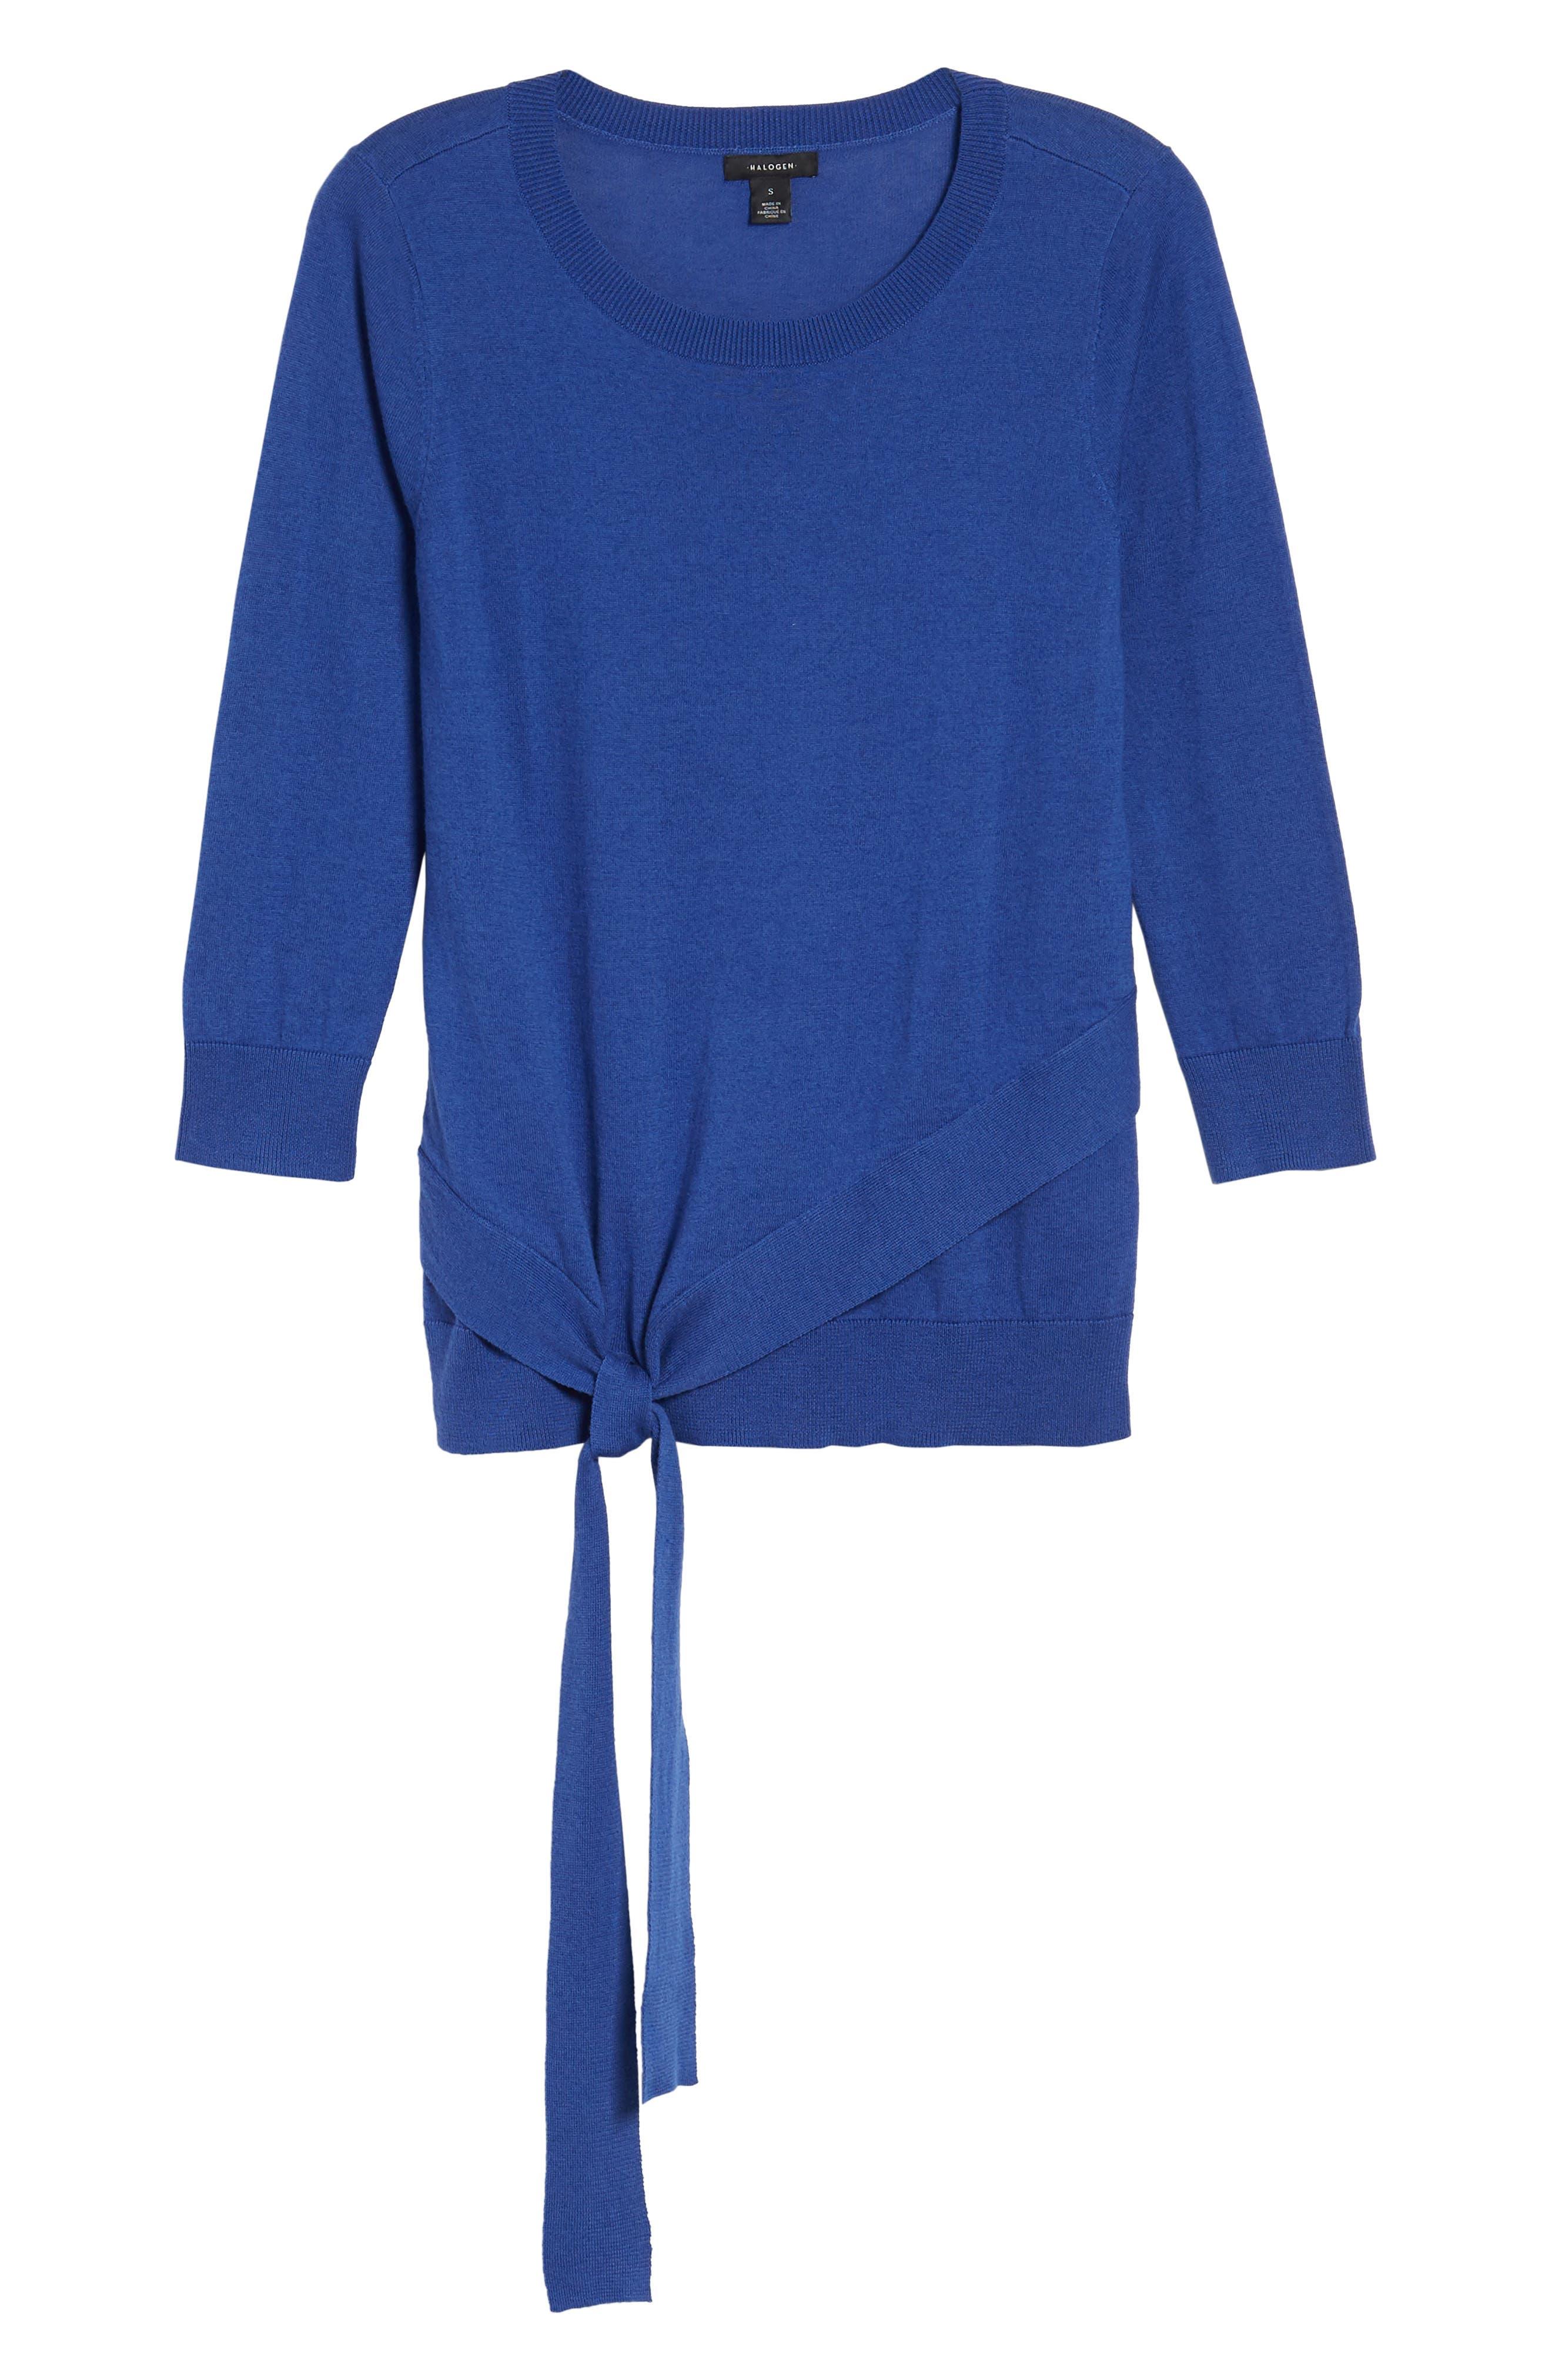 Pima Cotton Blend Tie Sweater,                             Alternate thumbnail 7, color,                             Blue Marine